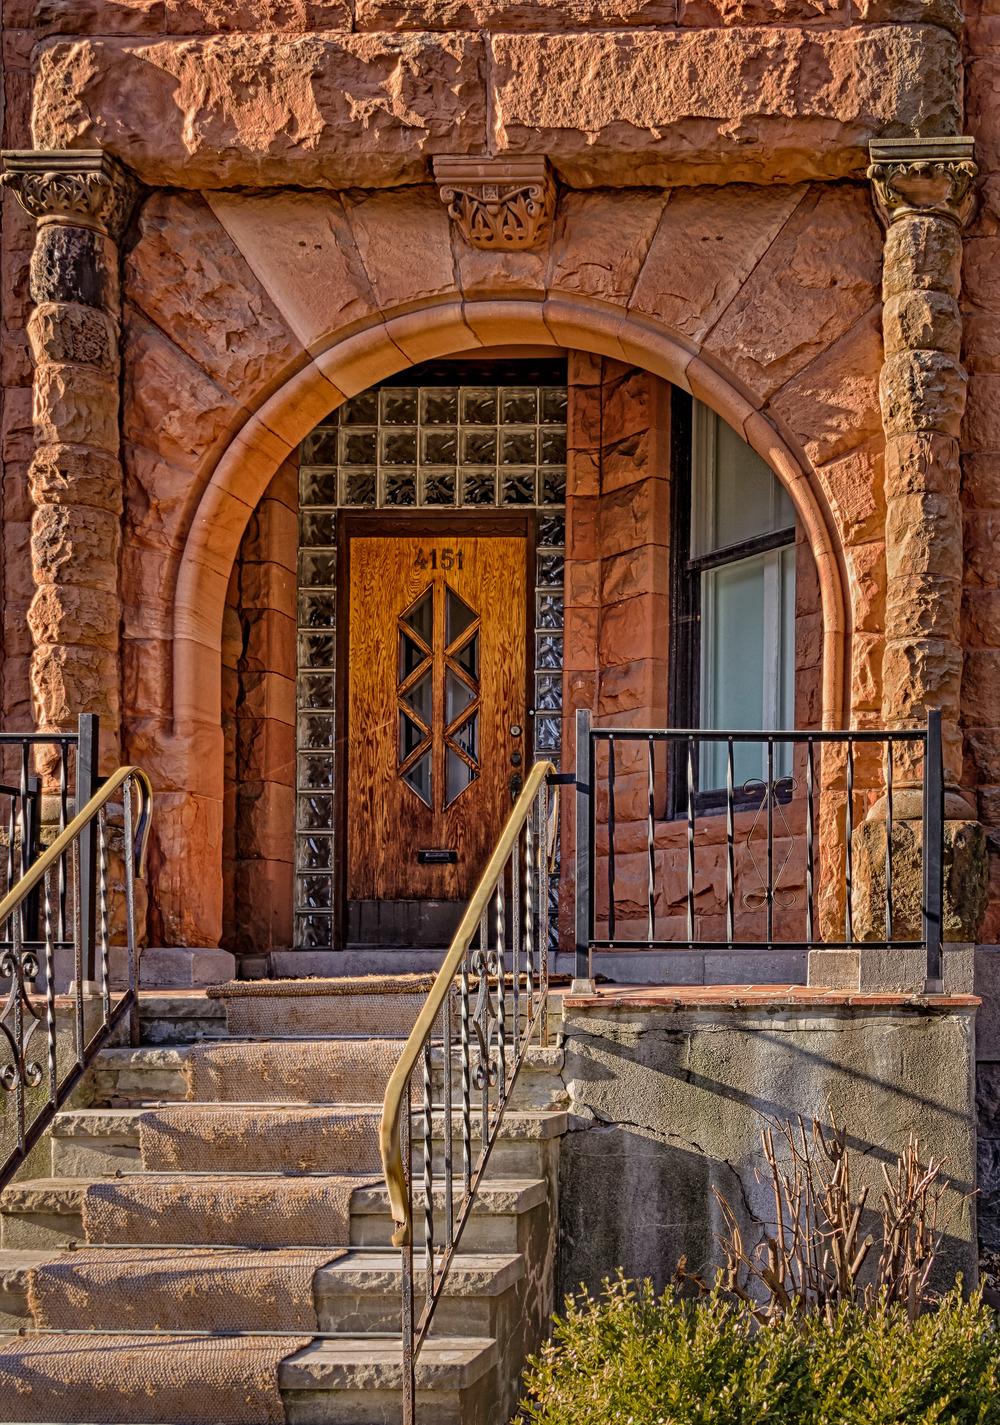 20131207_Doors-Maisonneve near Wood St.__MG_2021_HDR-Edit.jpg